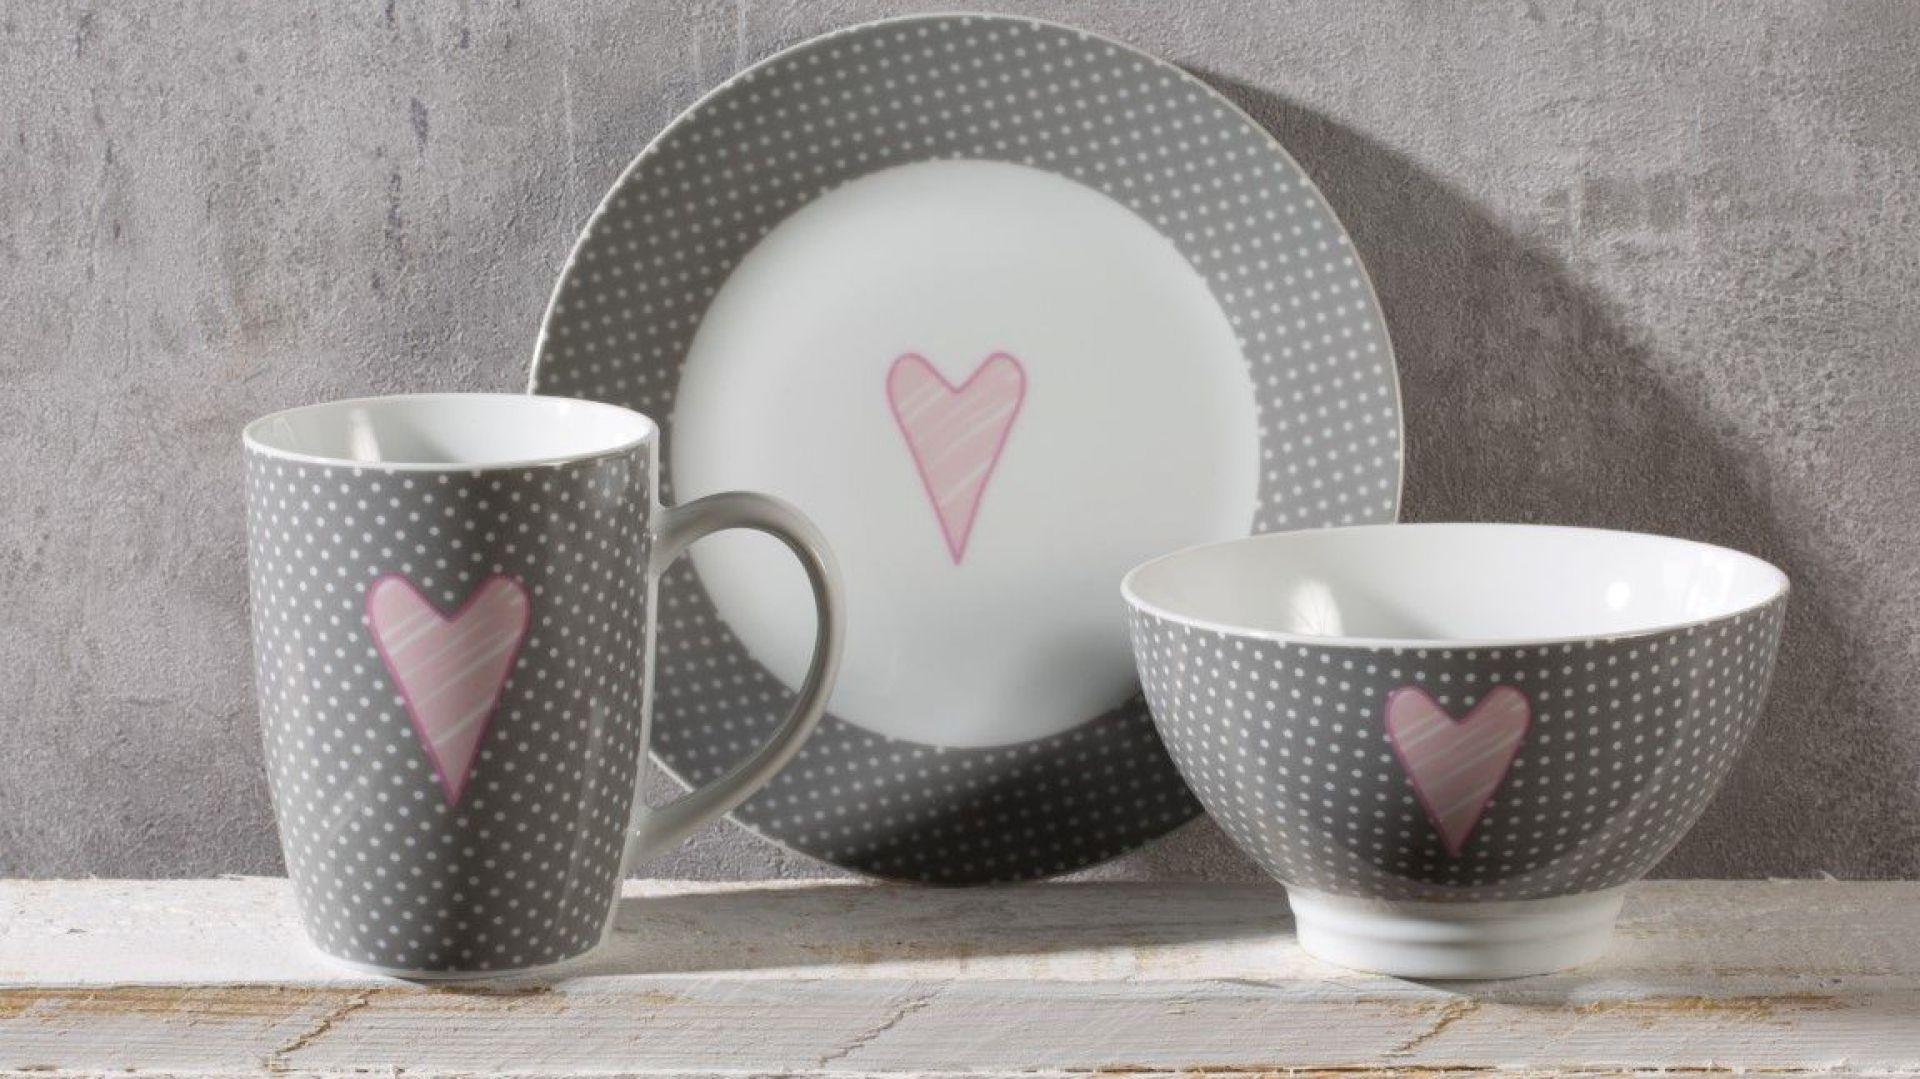 Pomysł na prezent z okazji Dnia Matki: ceramika Magie Dots. Fot. Dekoria.pl